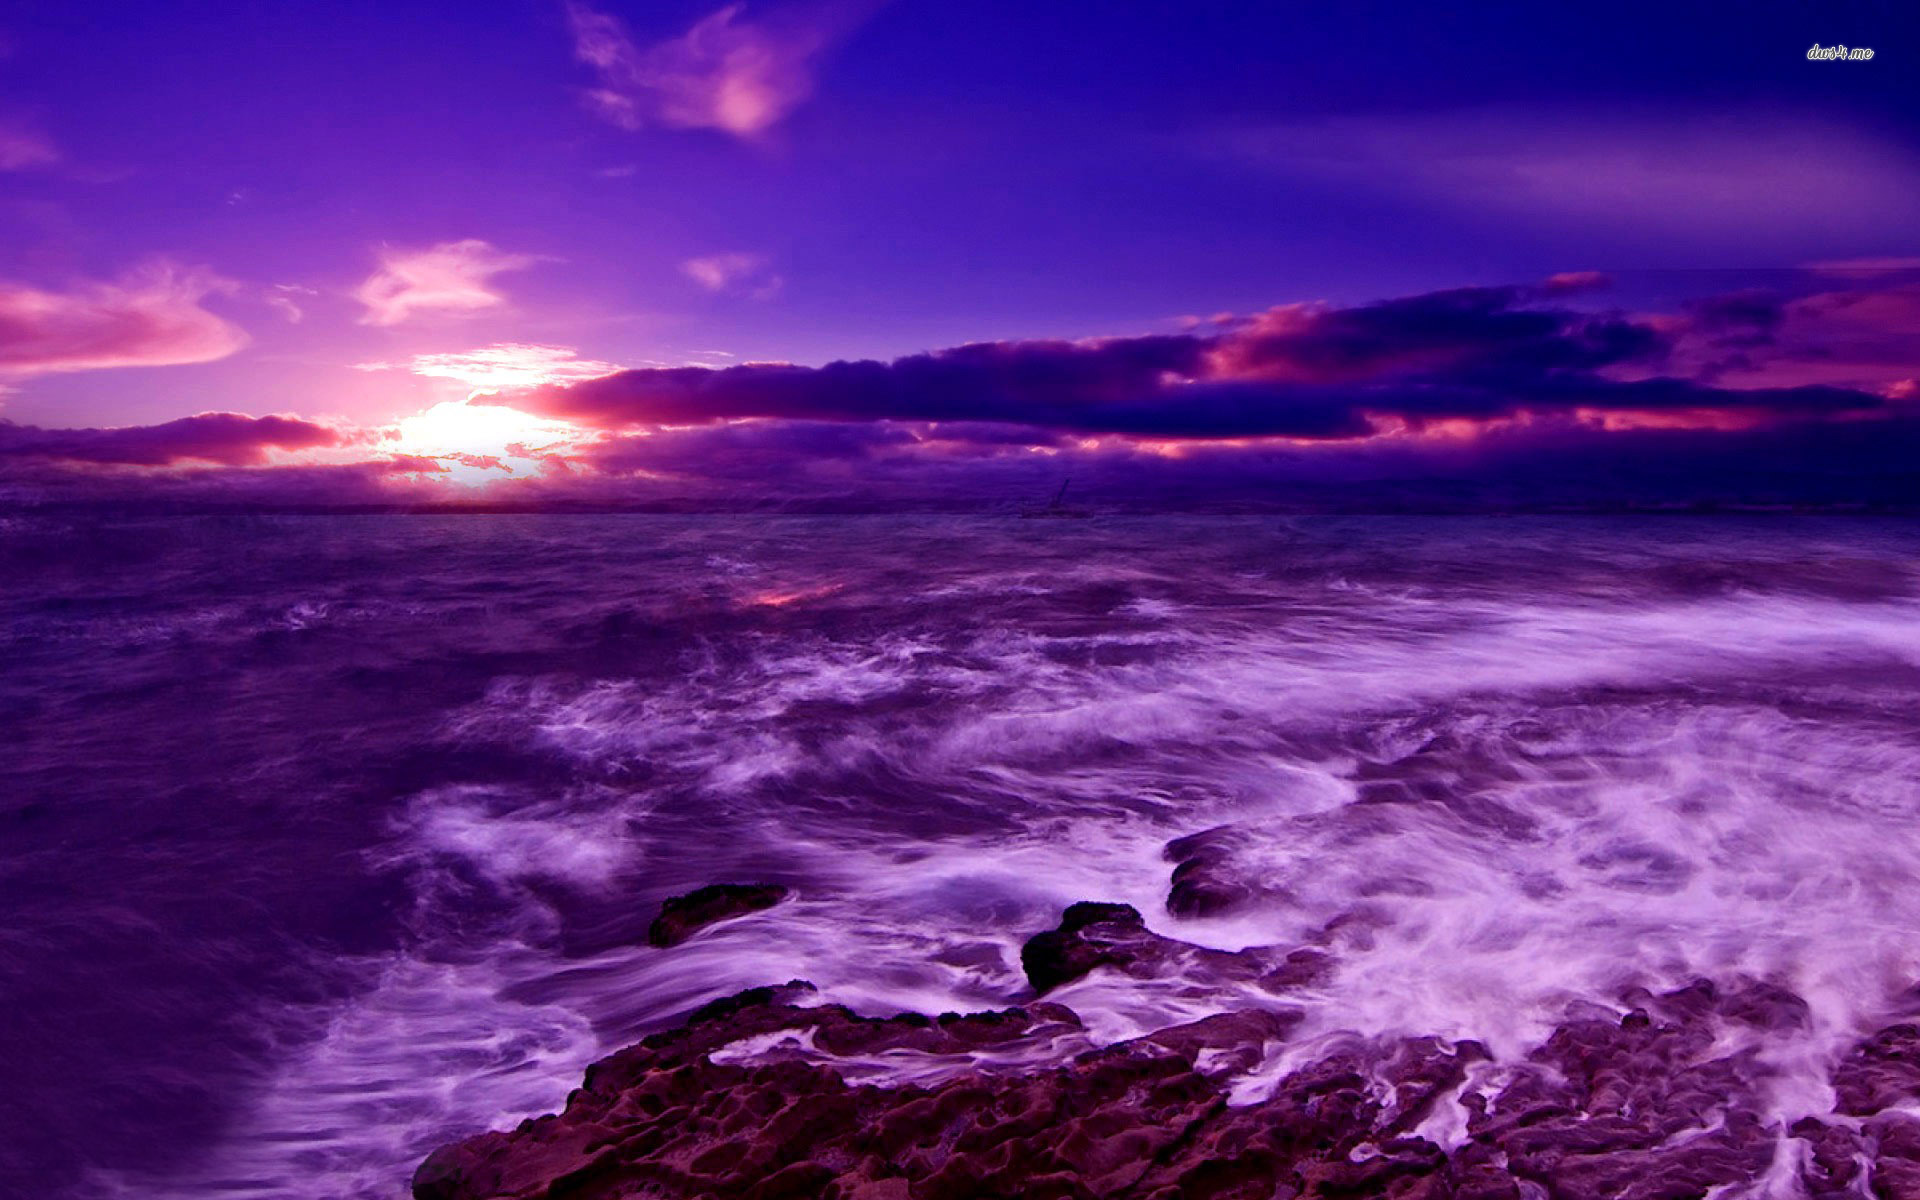 sea wallpaper,sky,sea,nature,ocean,purple